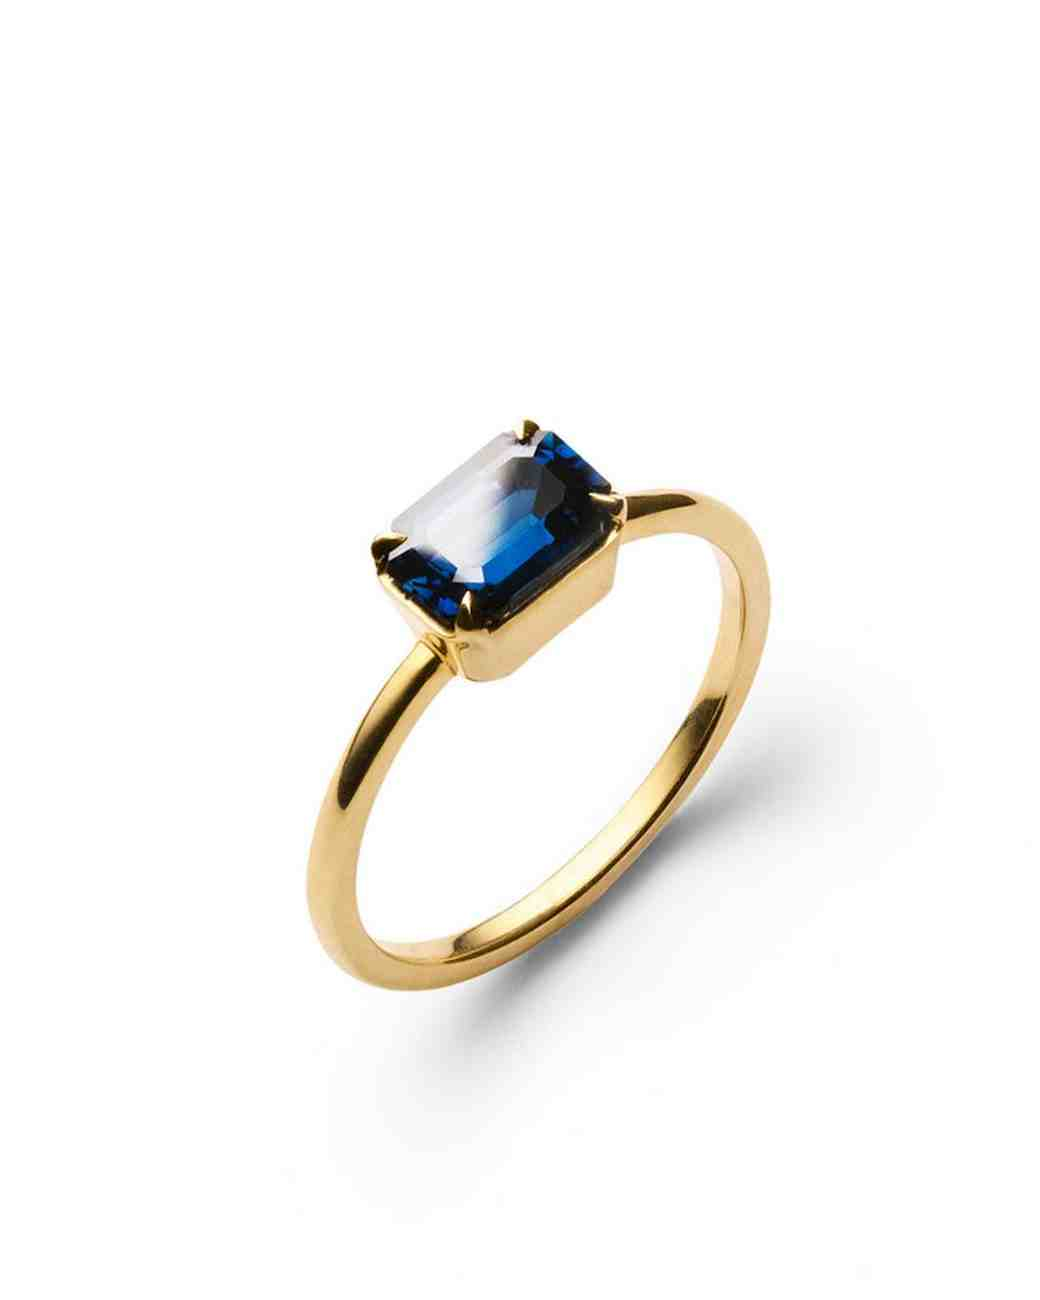 east-west-engagement-ring-nora-kogan-0116.jpg